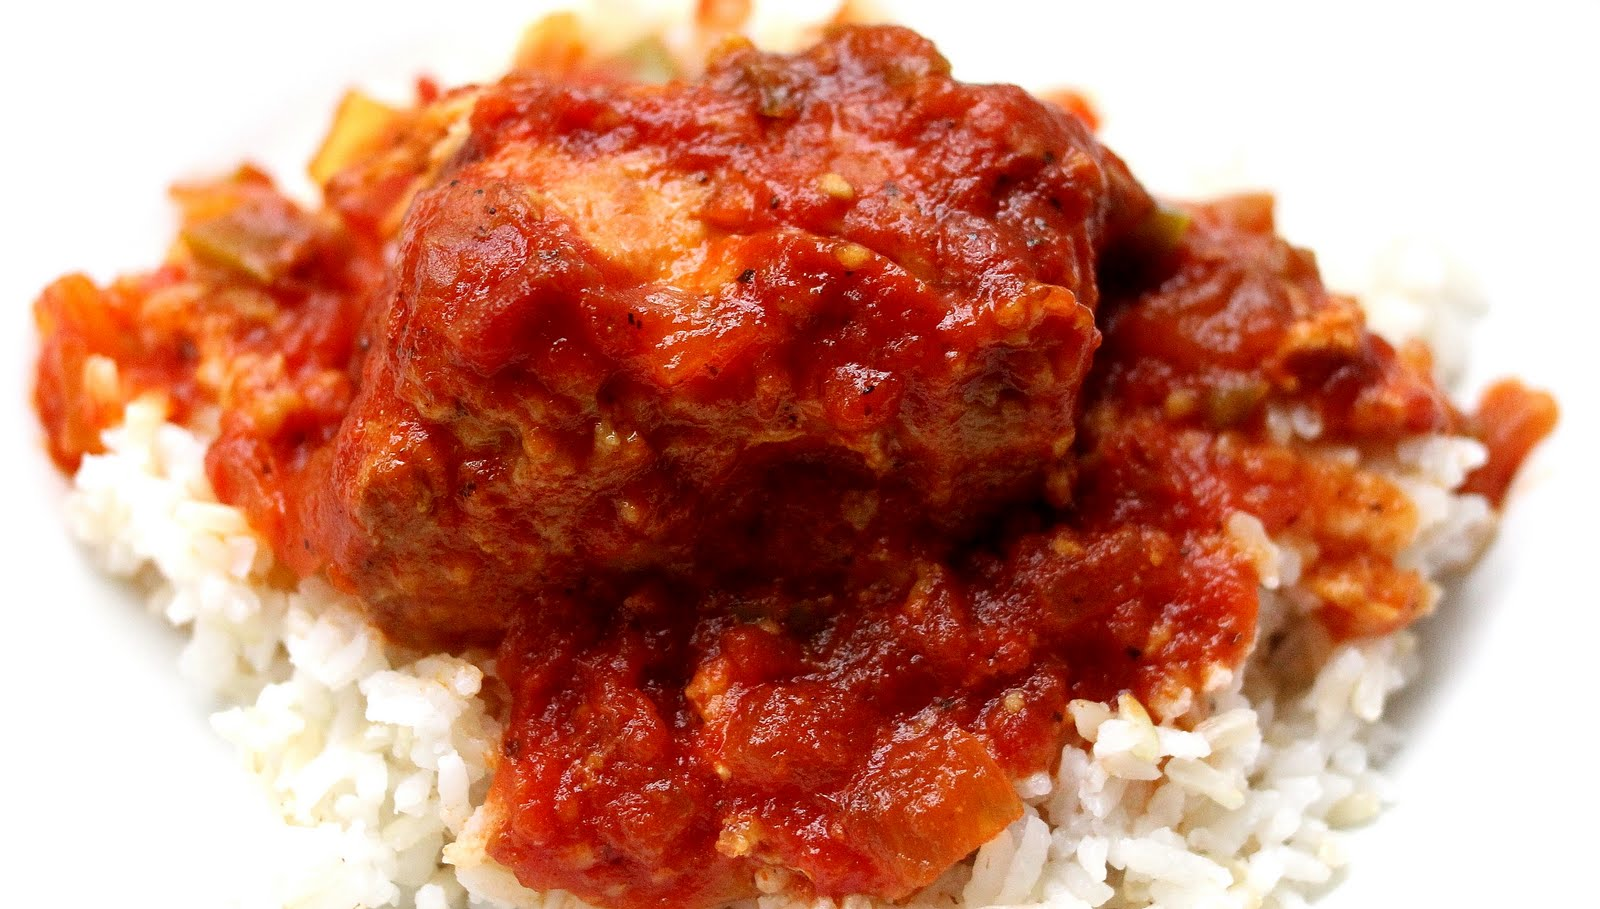 On My Menu: Curried Chicken Cacciatore